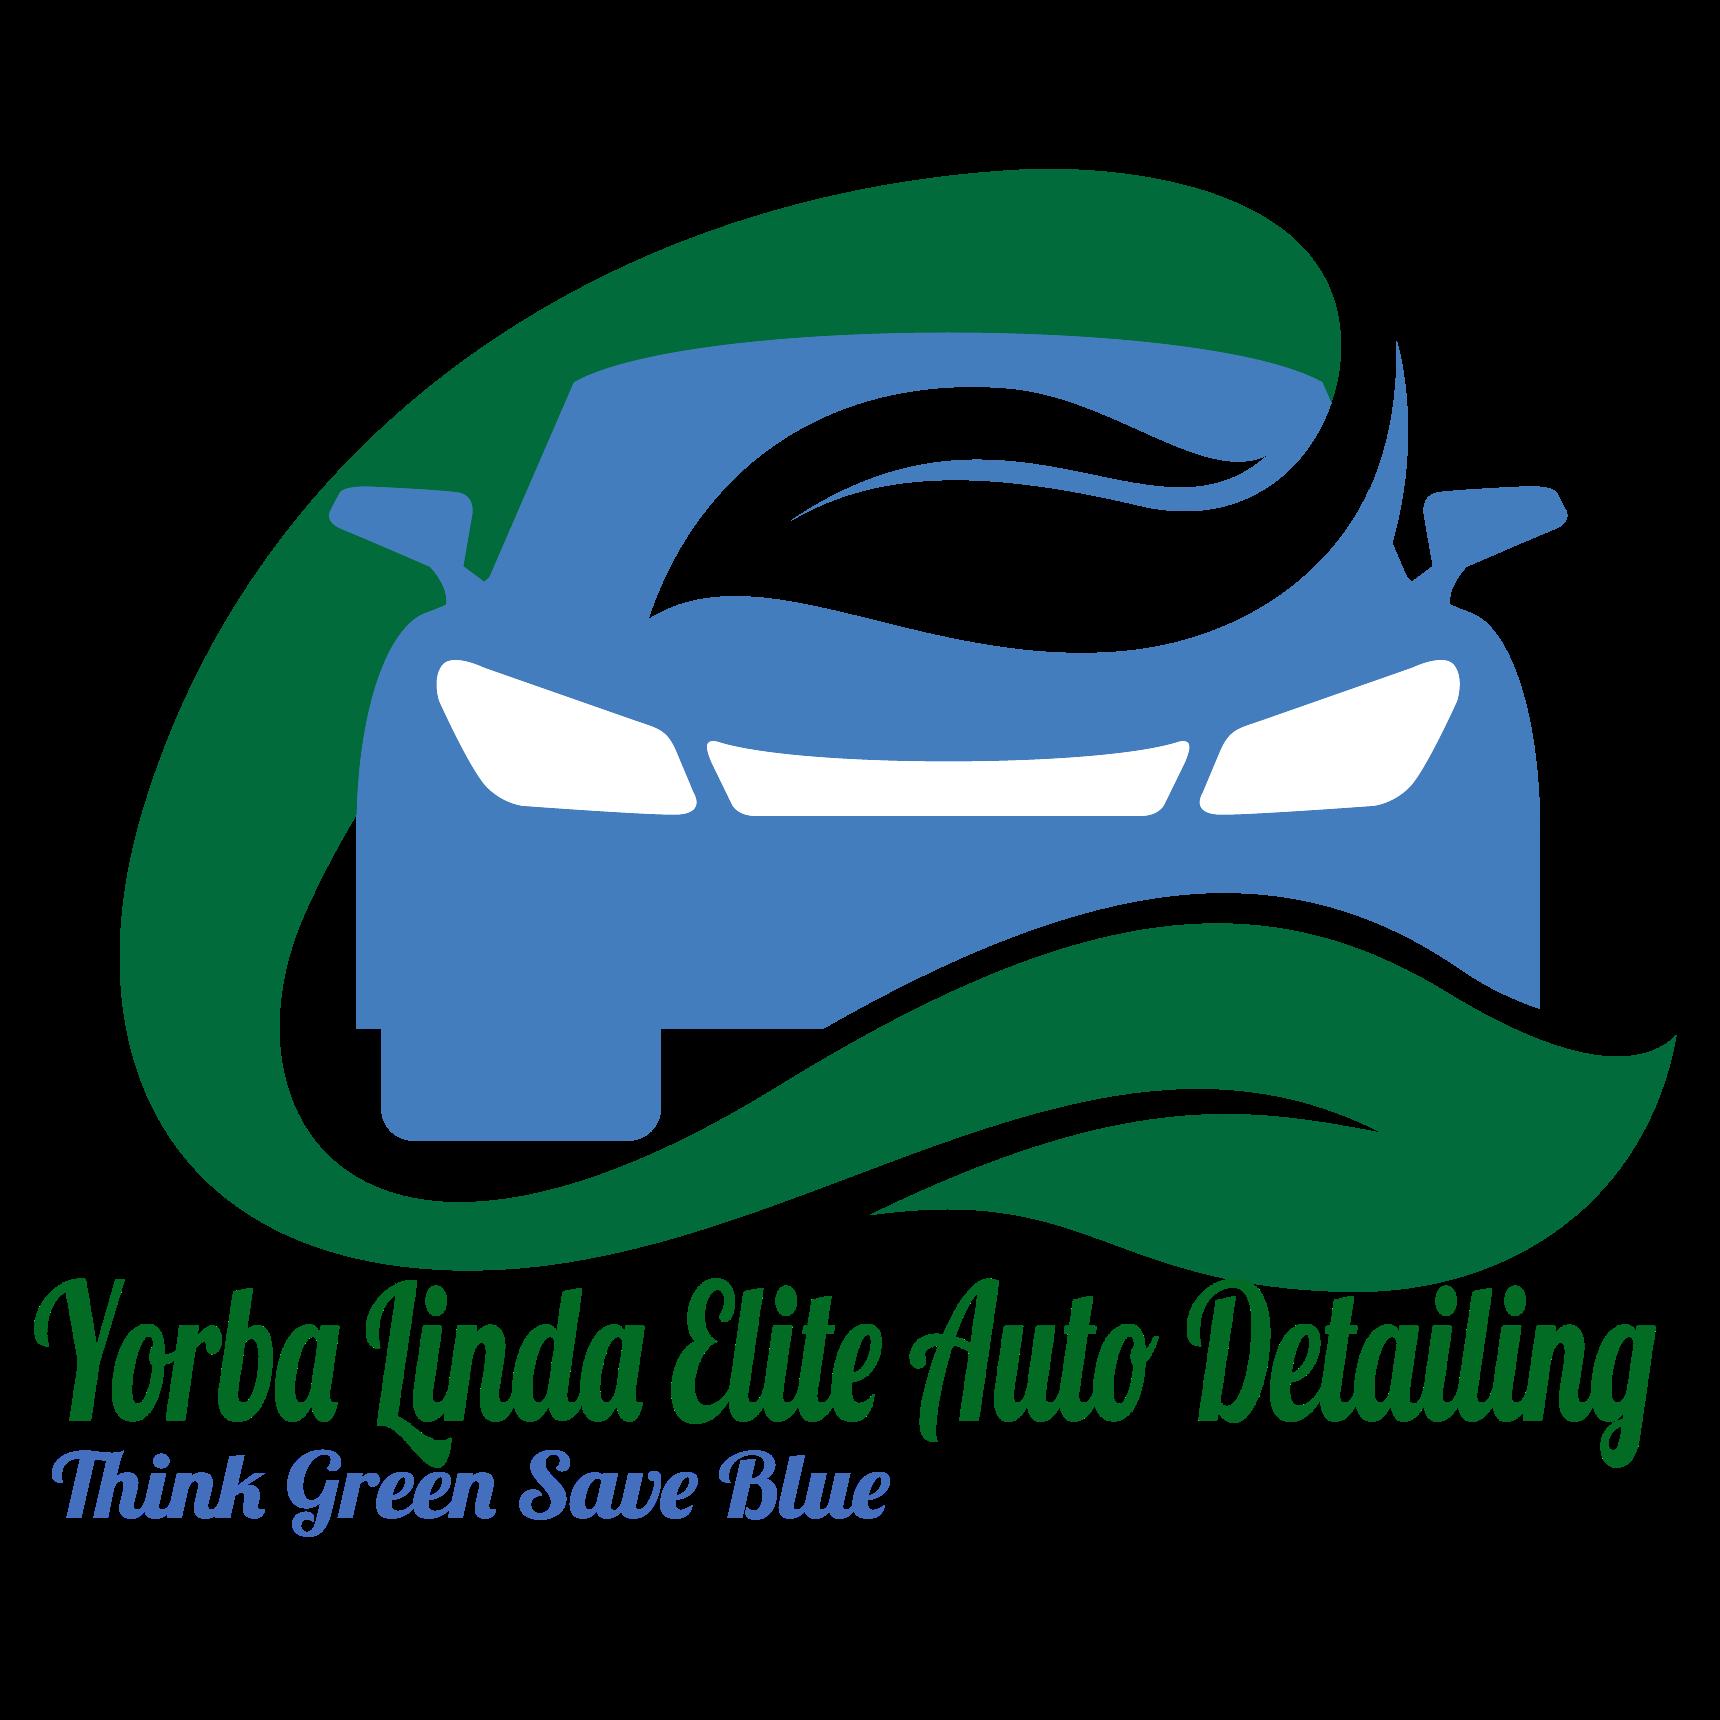 Yorba Linda Elite Auto Detailing